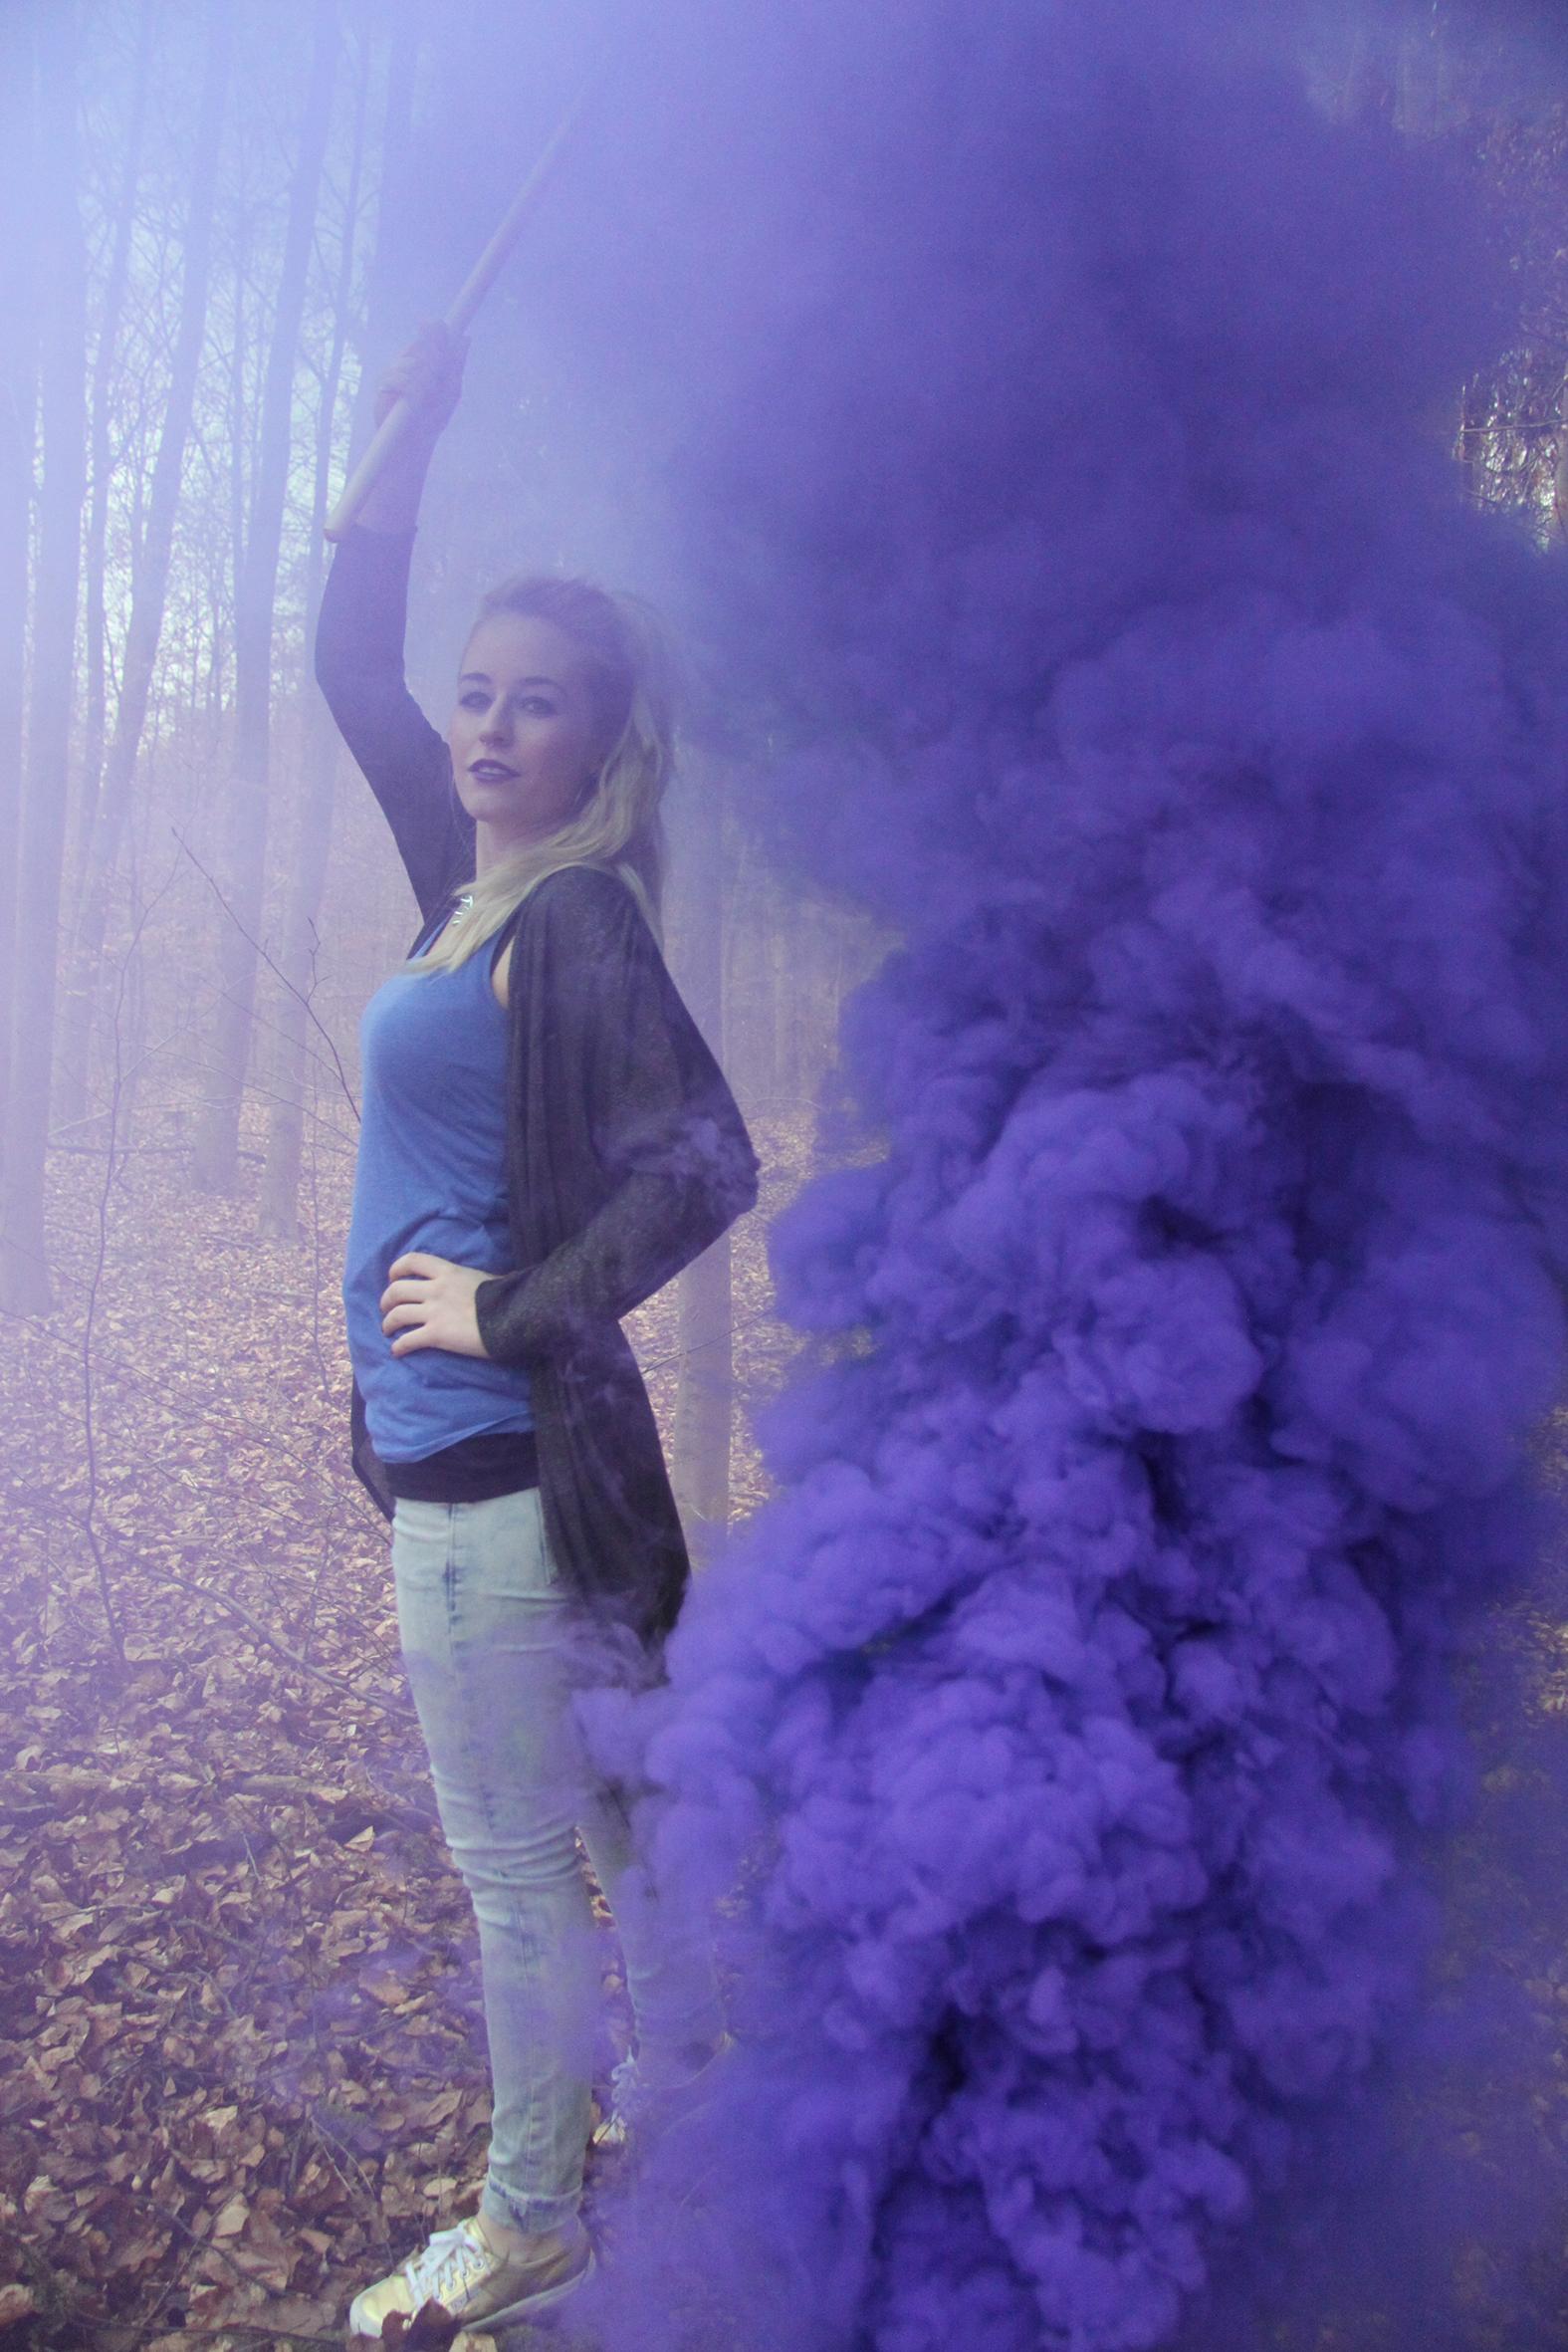 rauchbombenshooting4